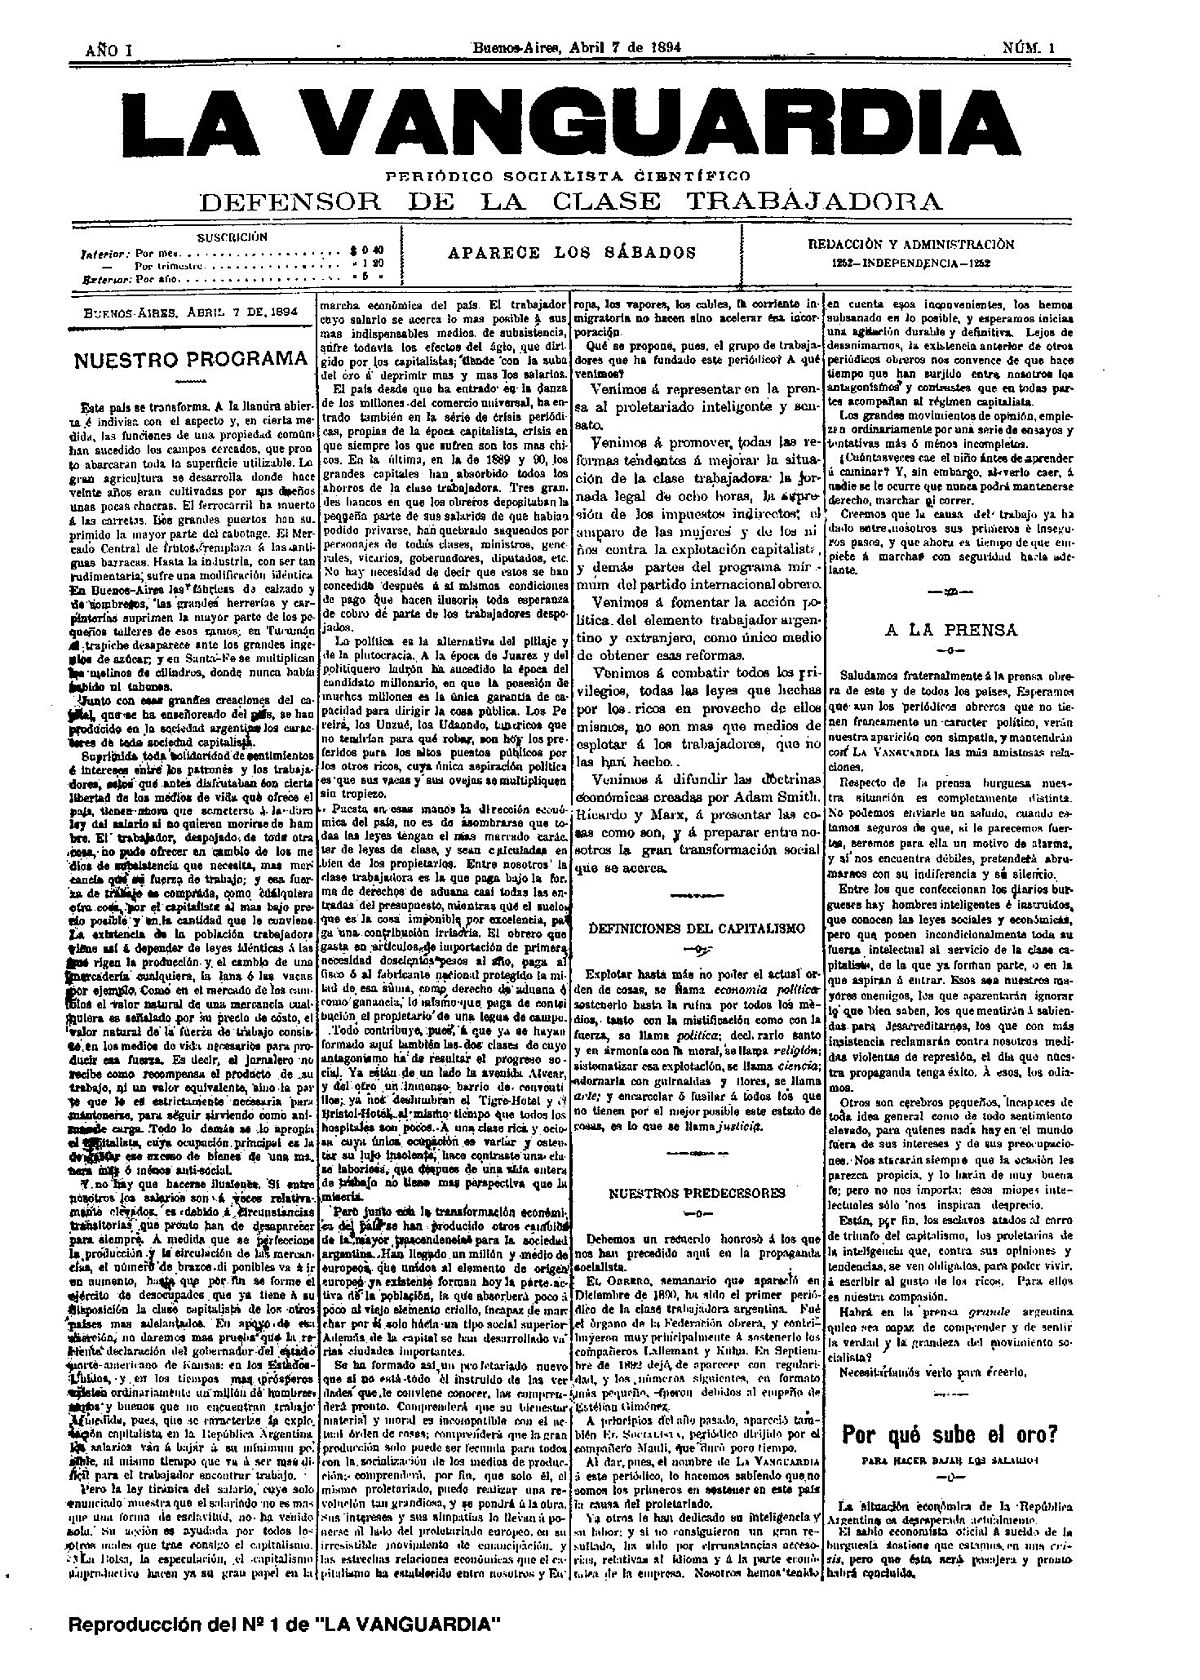 La vanguardia peri dico de argentina wikipedia la for Paginas de chimentos argentina